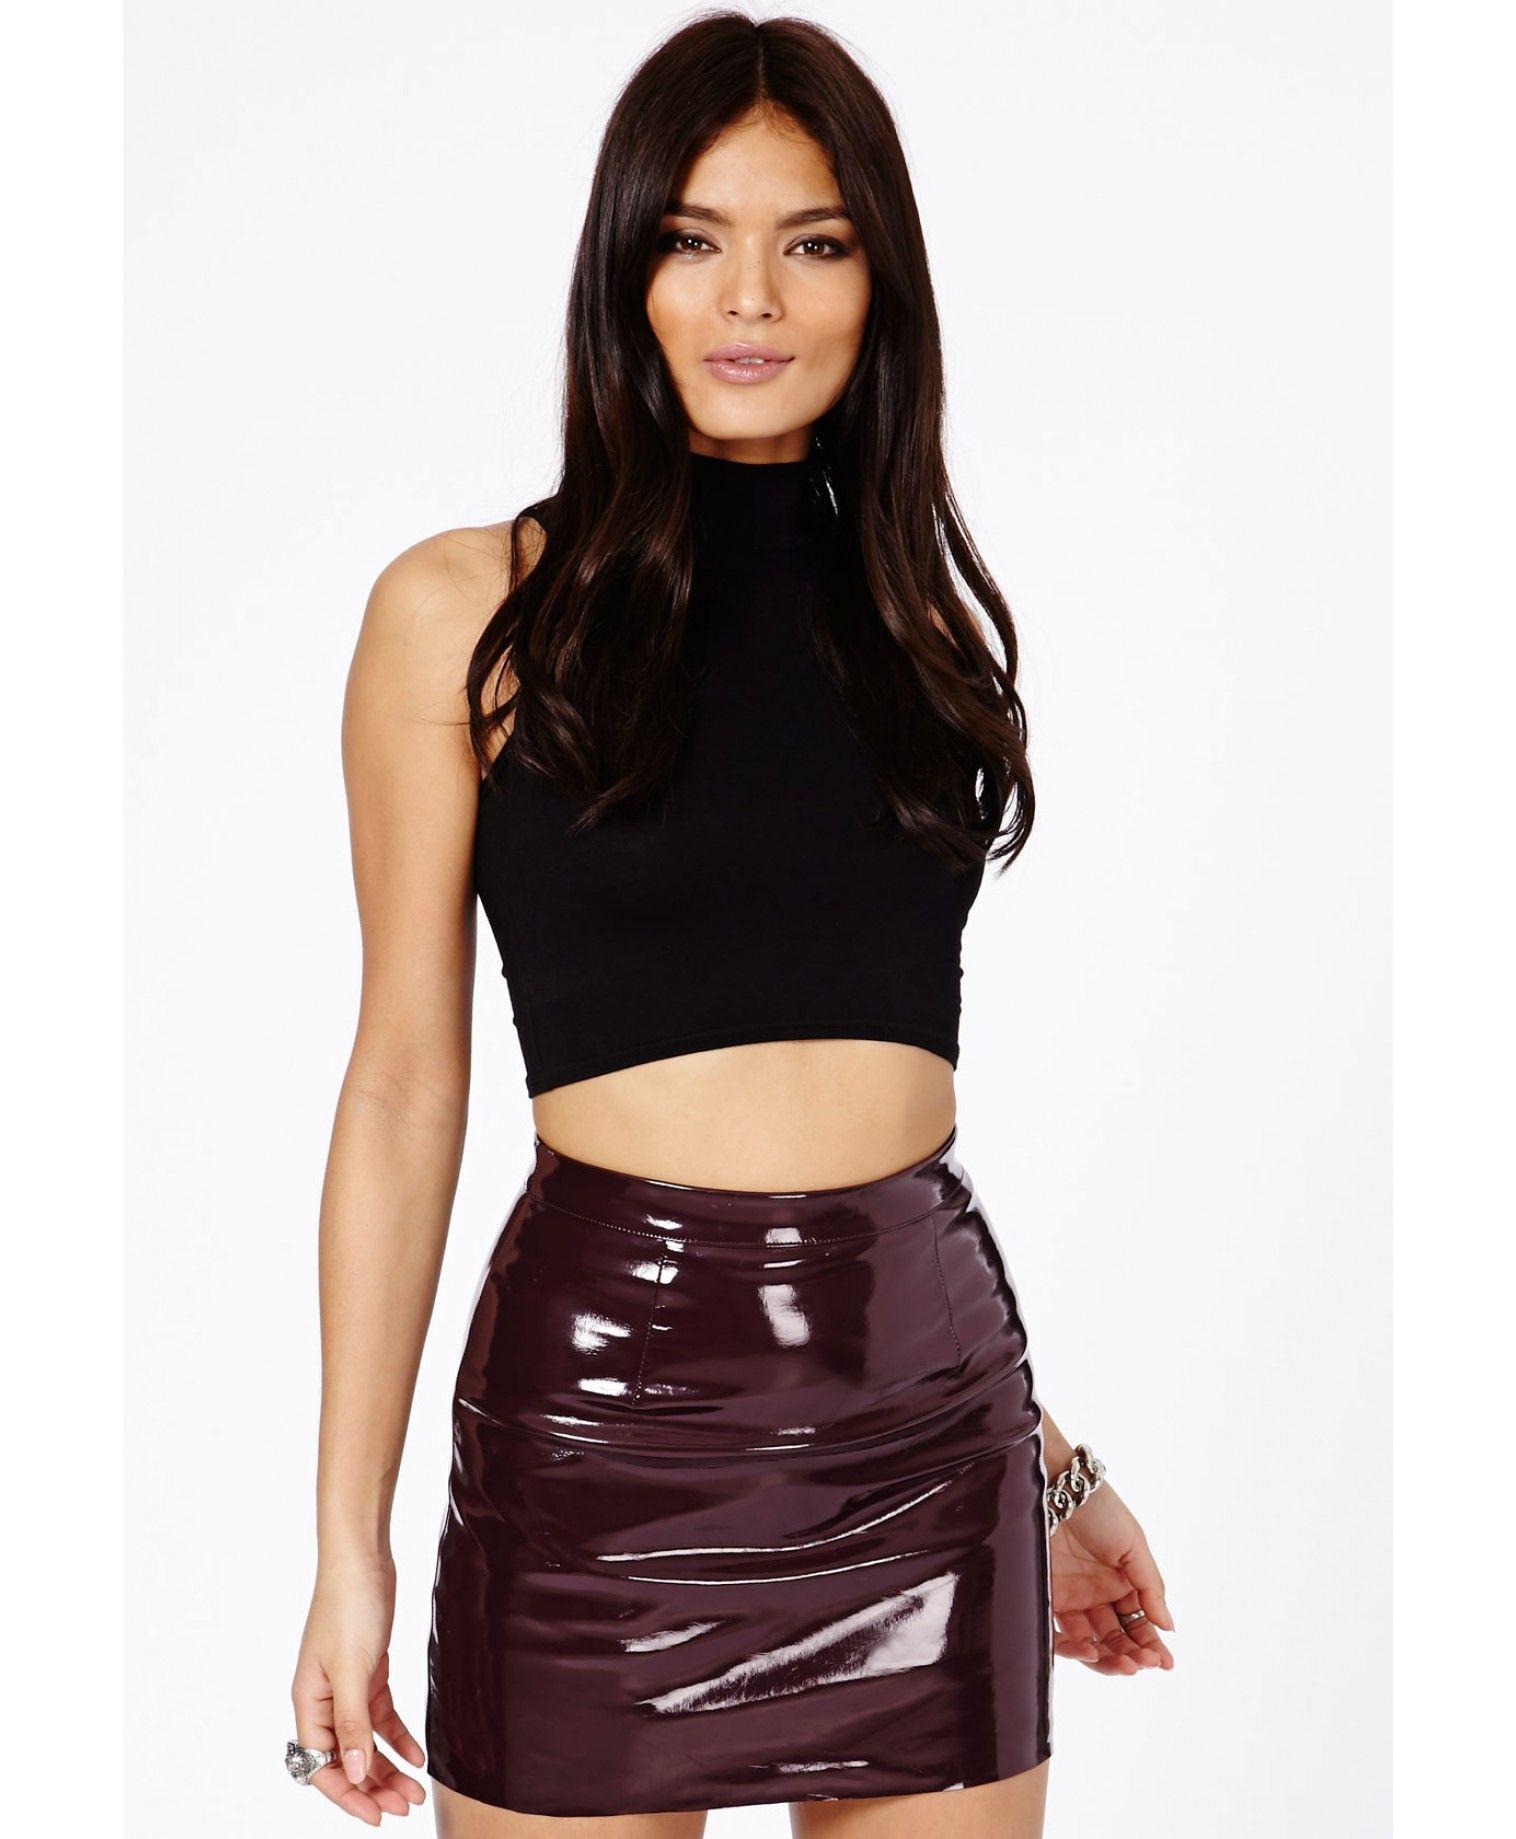 69489f5d7a3248 Nagsia PVC Mini Skirt - Skirts - Mini Skirts - Missguided | PVC ...